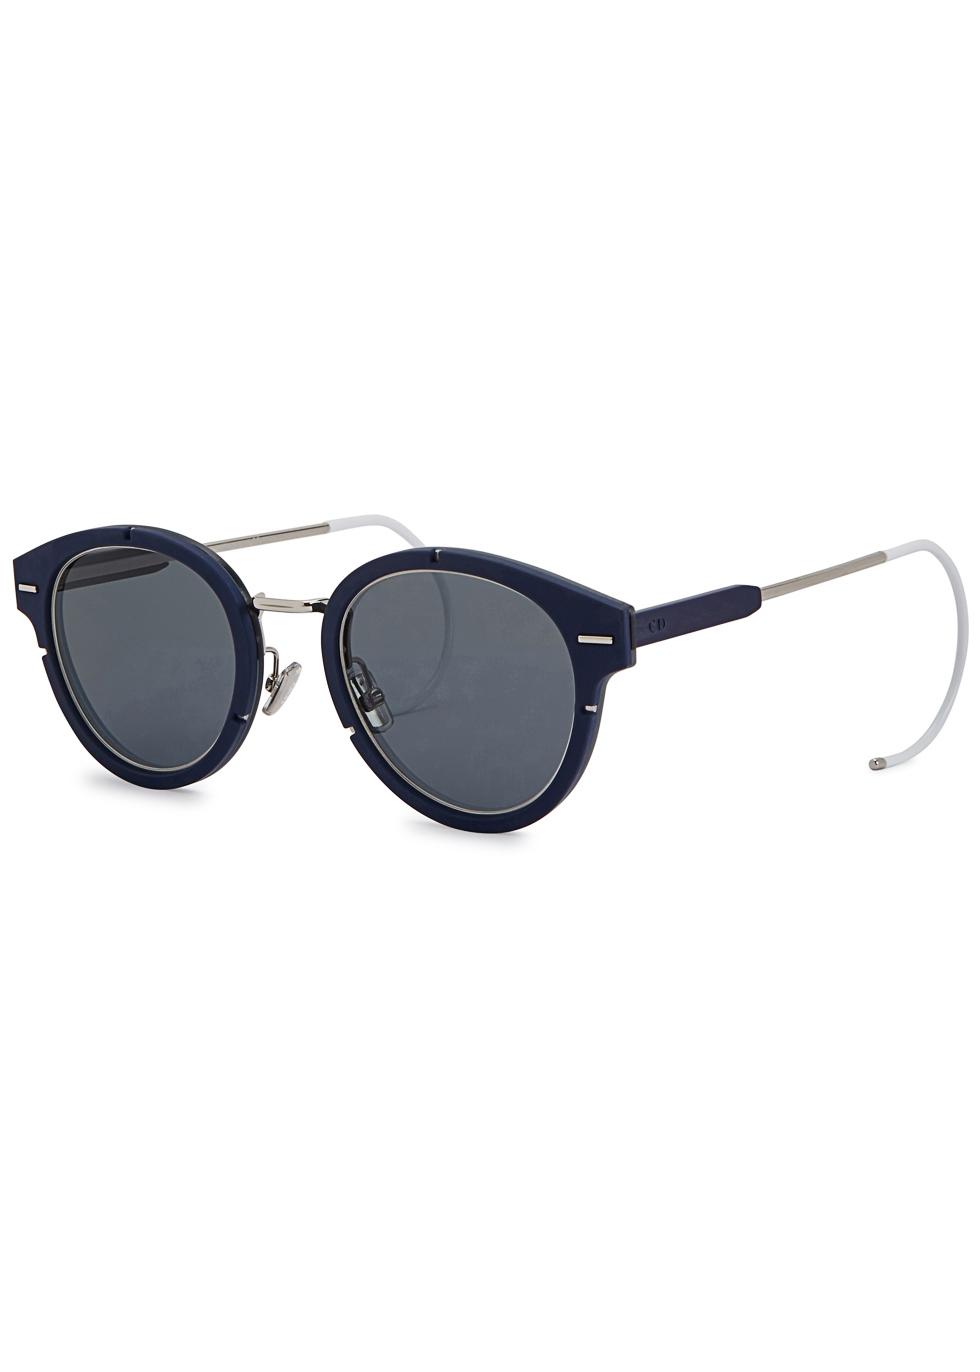 Dior Magnitude 01 blue round-frame sunglasses - Dior Homme